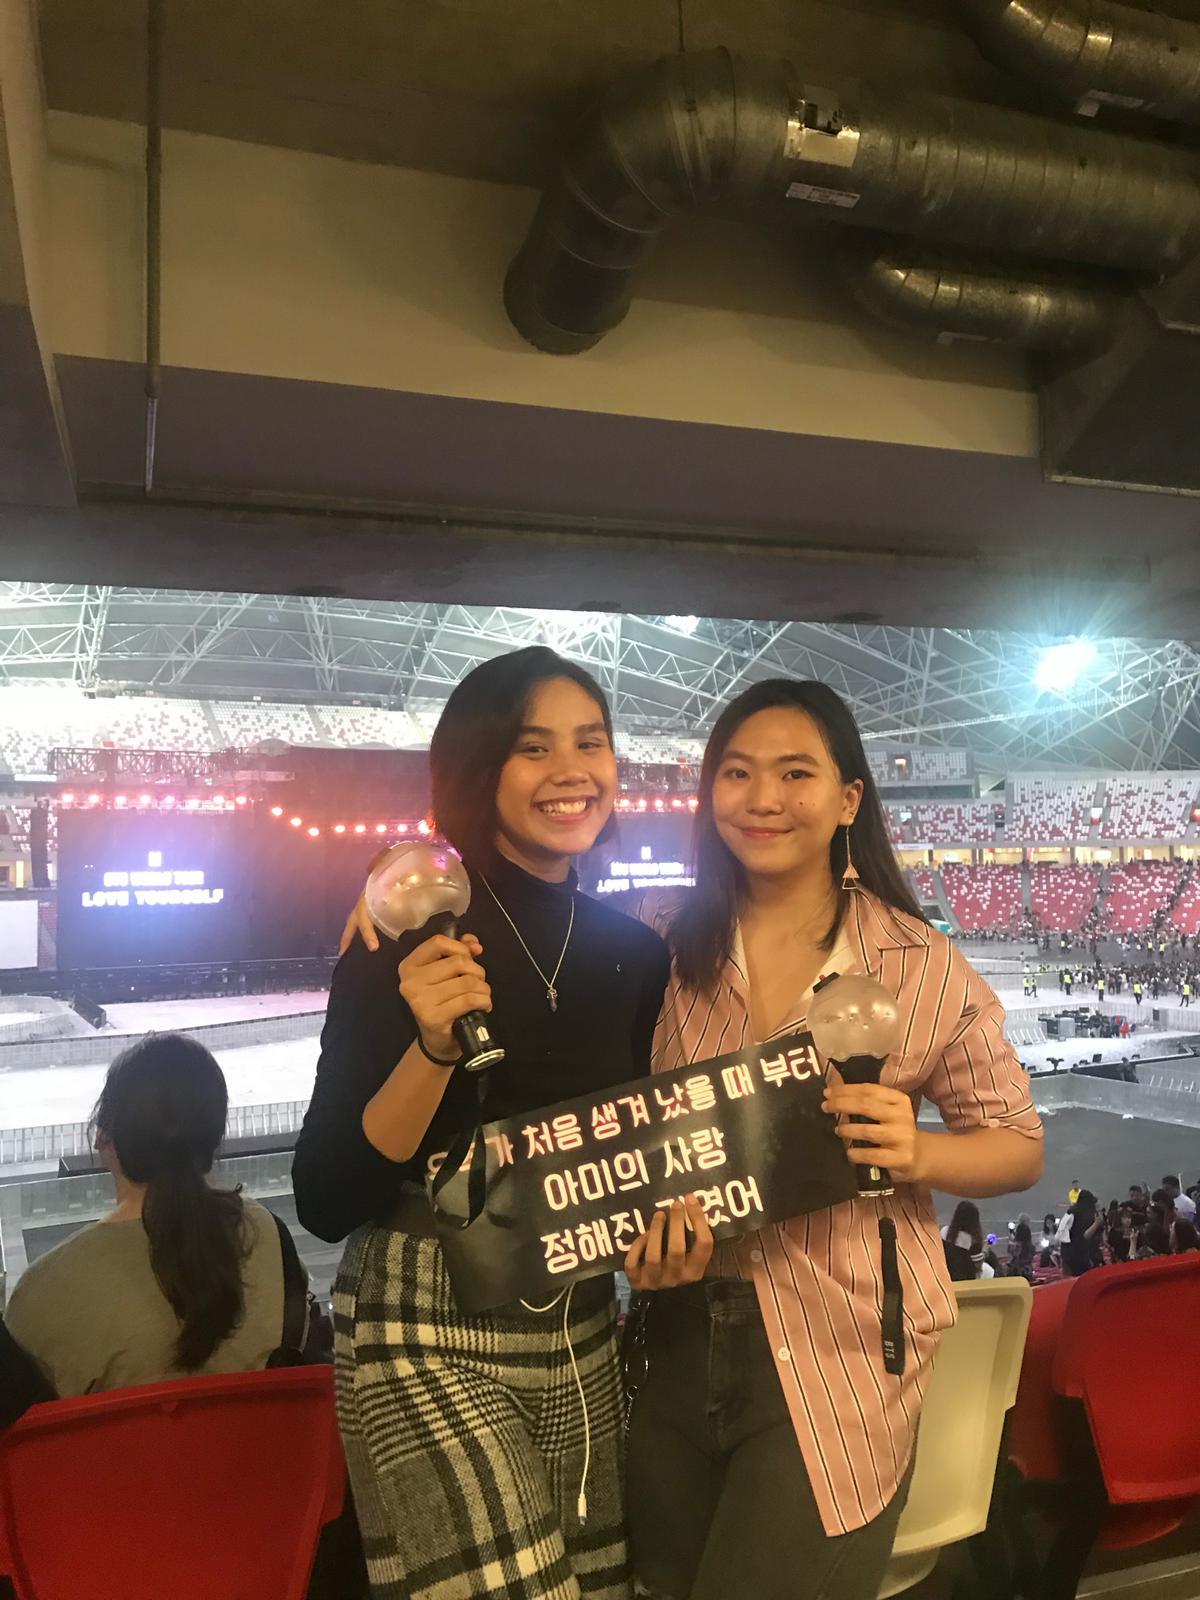 BTS-concert-kpop-fans